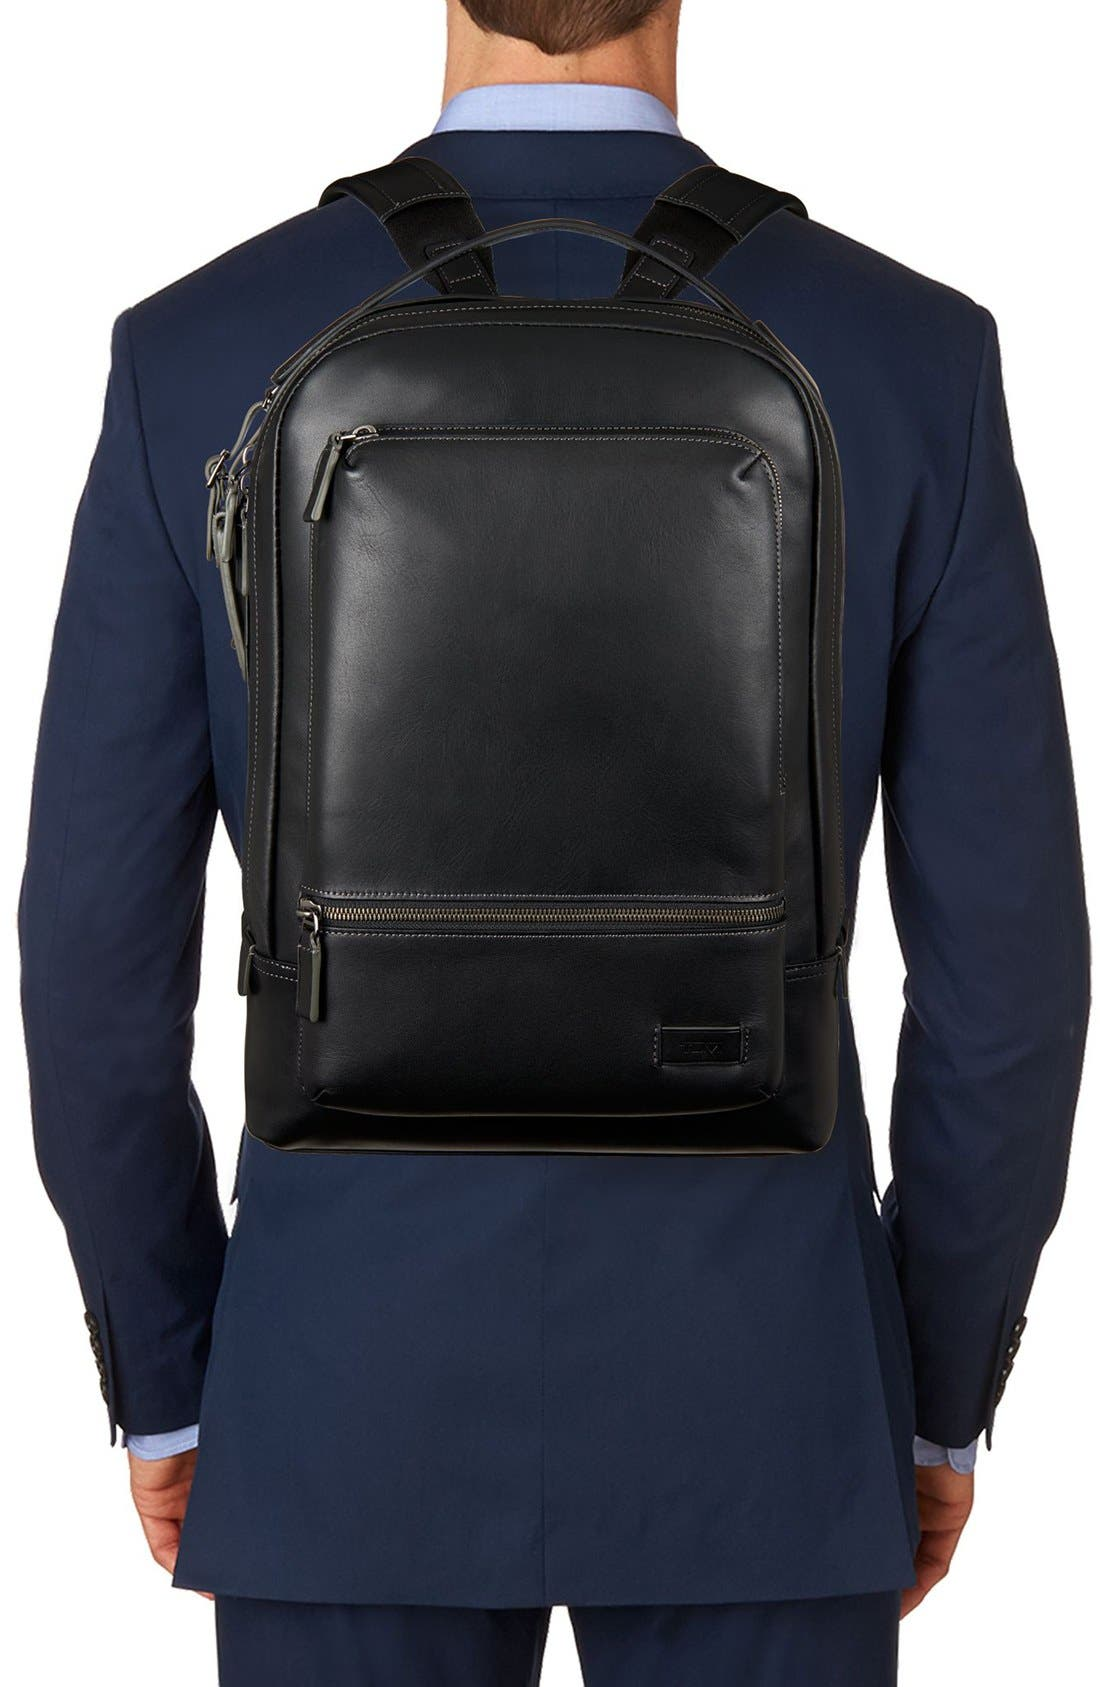 'Harrison - Bates' Leather Backpack,                             Alternate thumbnail 5, color,                             001